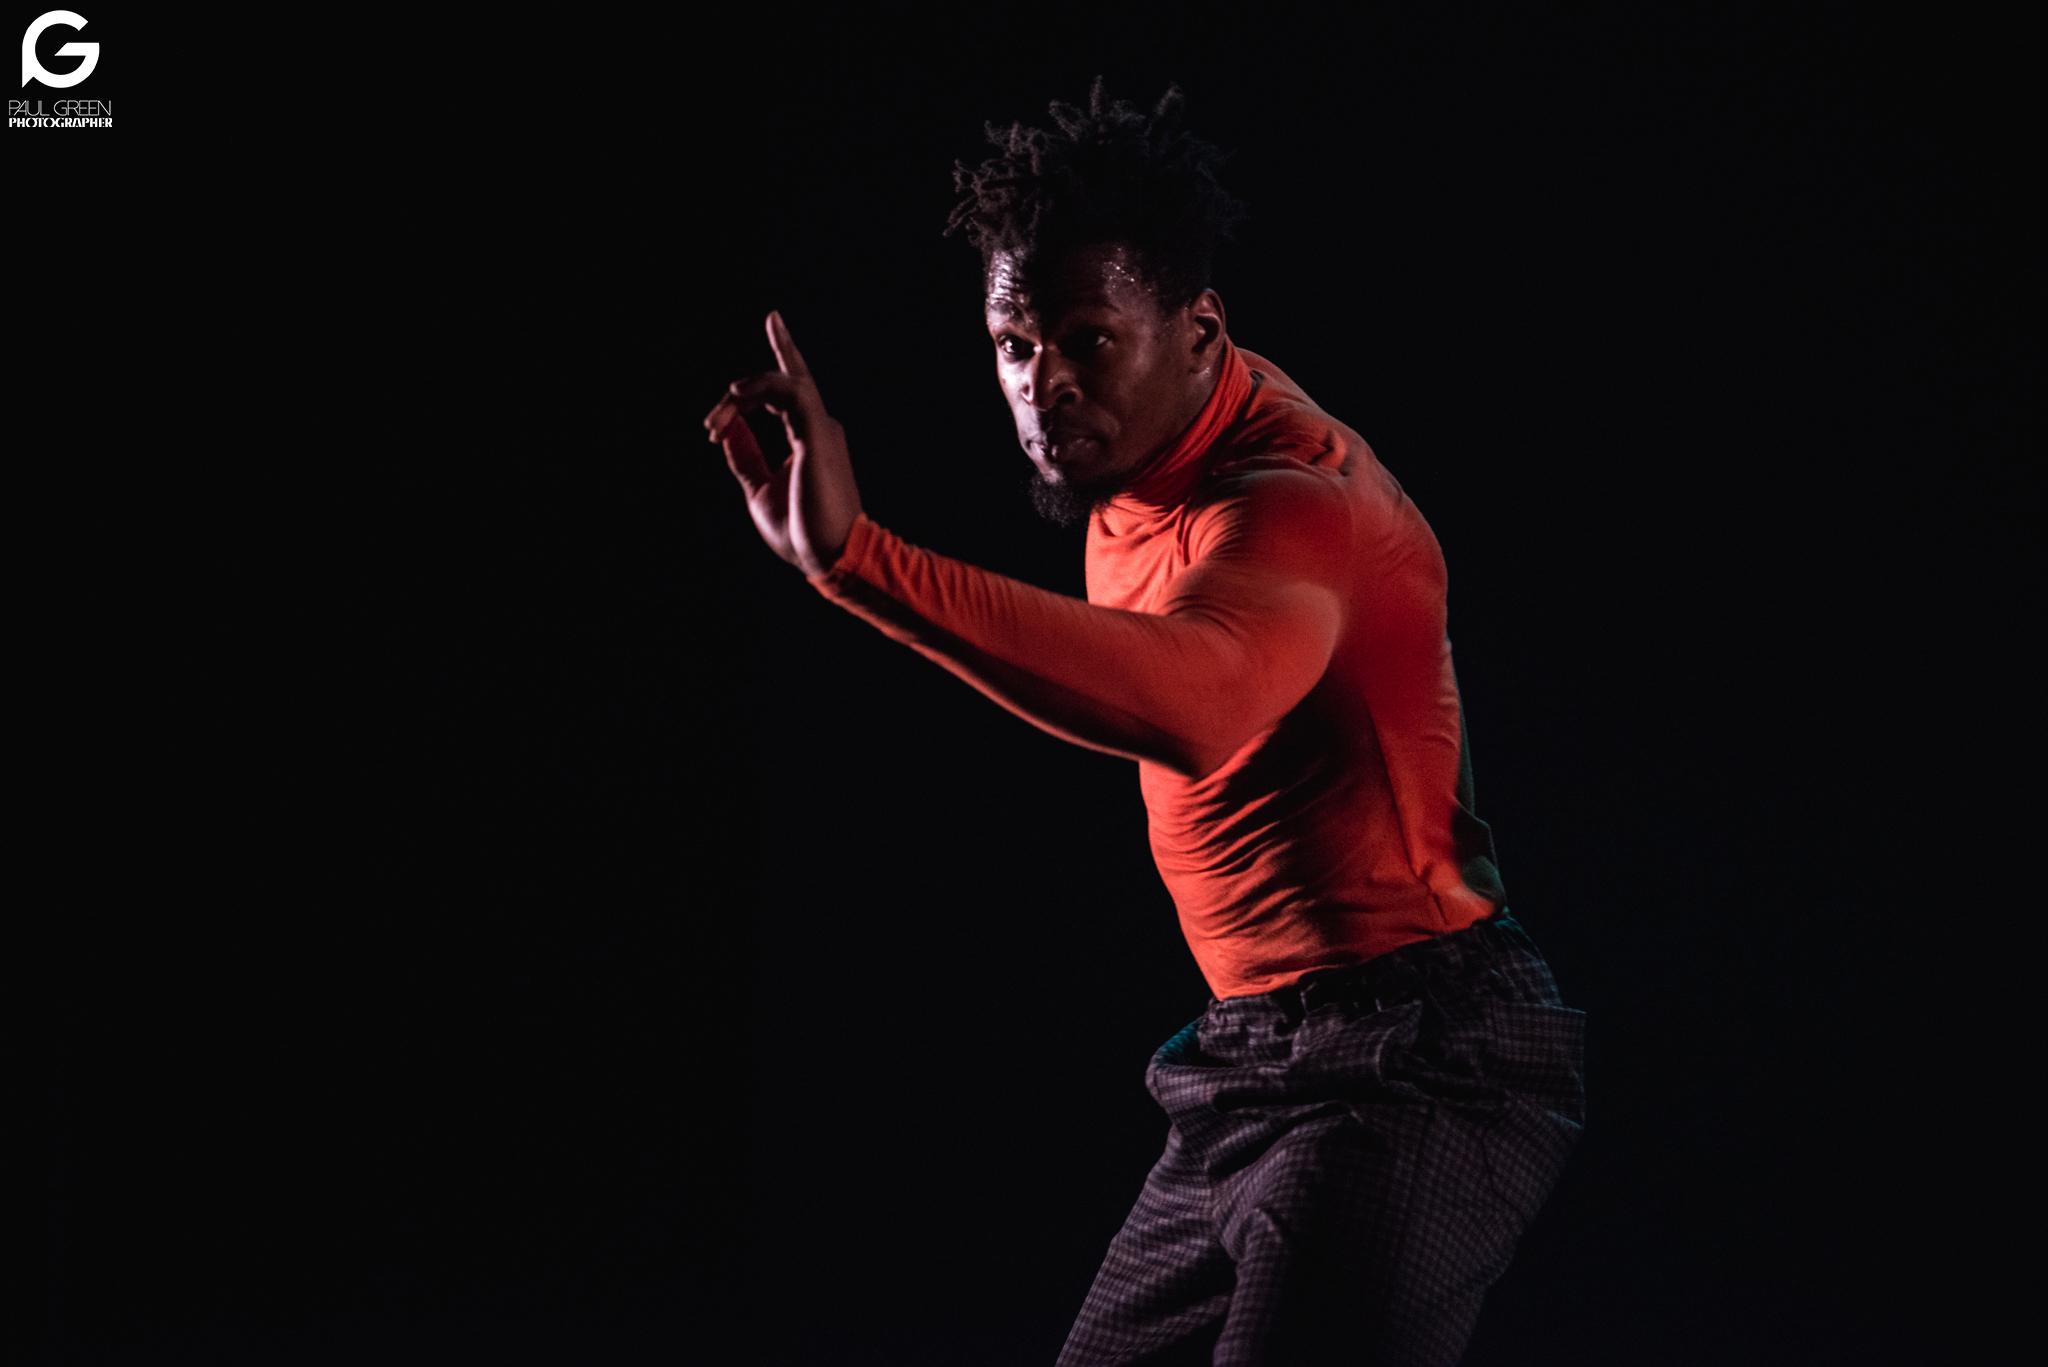 issiaka karamoko, salsa hip hop, chenôve, spectacle salsa hip hop, danse, chorégraphe, xtremambo, scène, paris salsa hip hop,